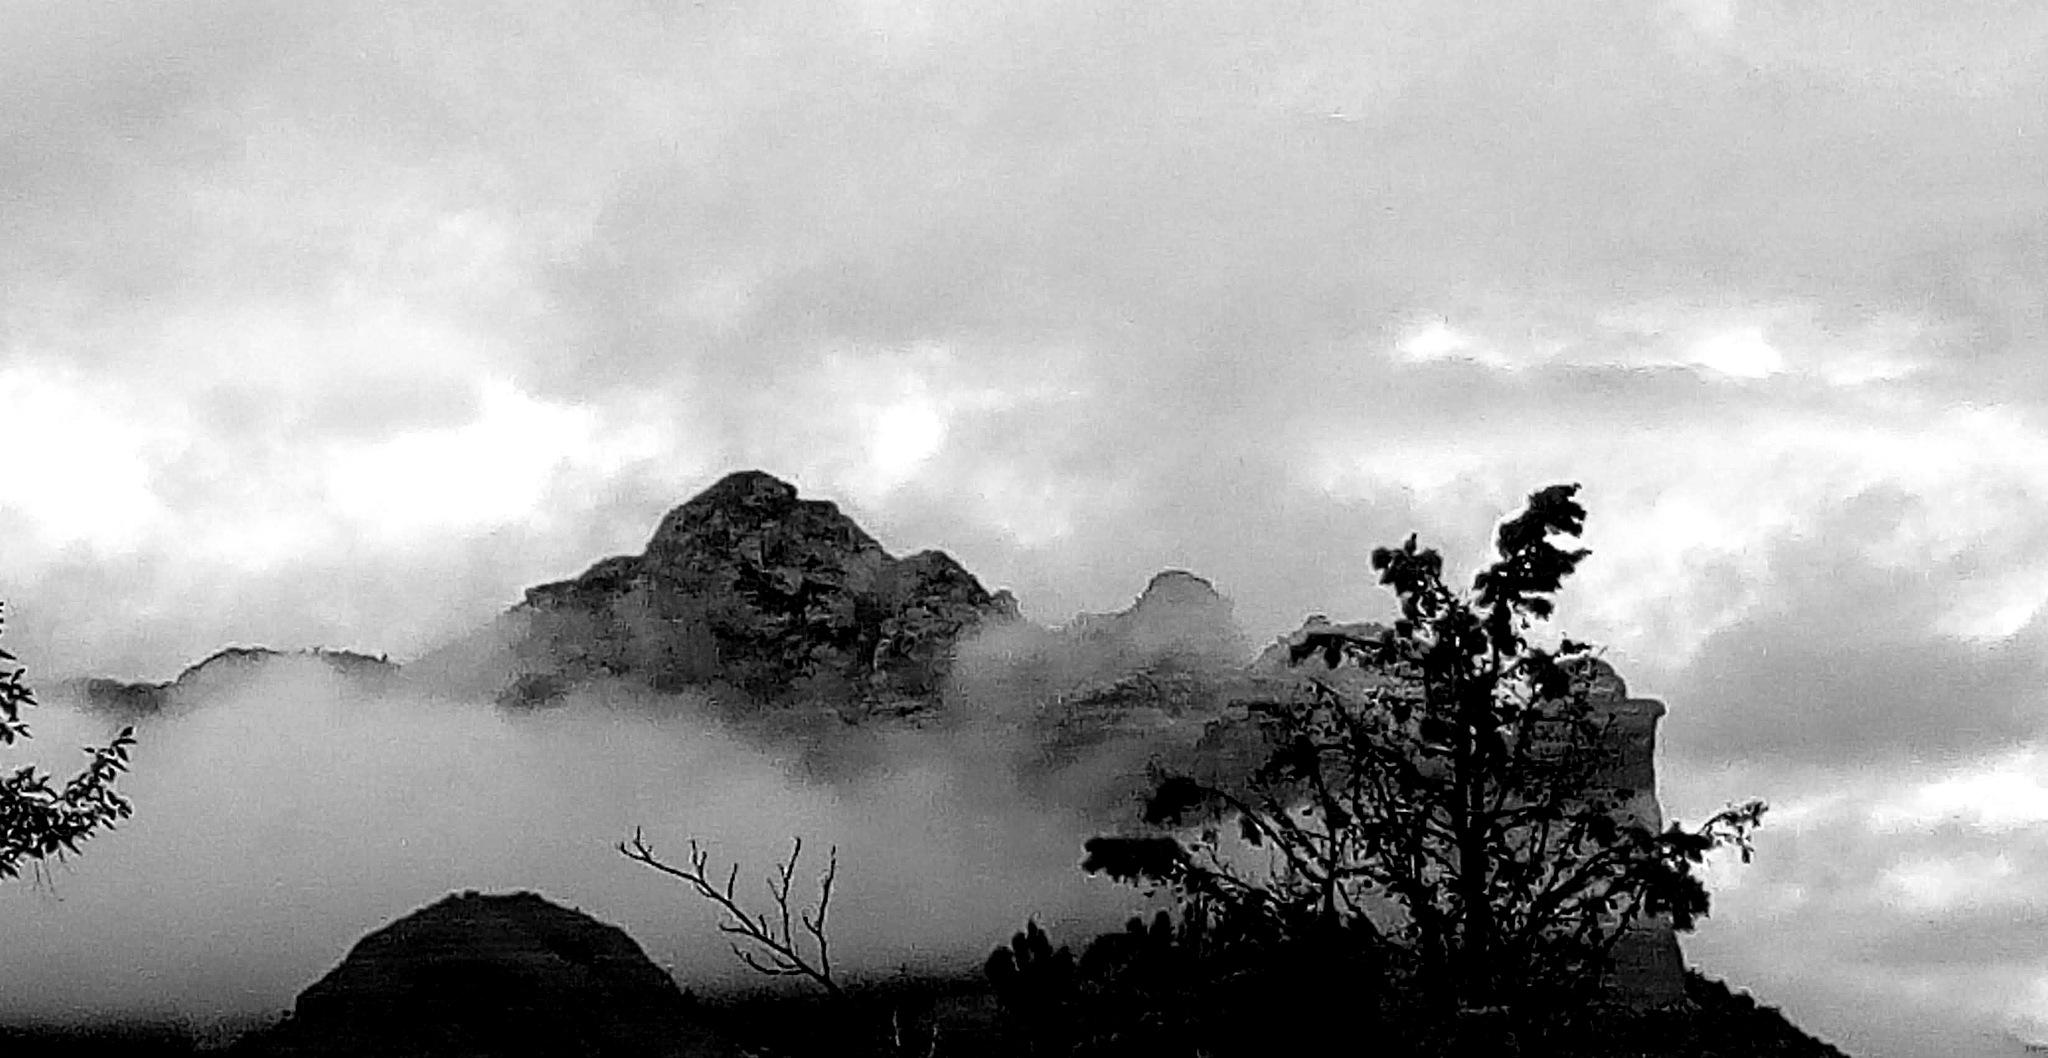 Early October Morning by molterserrano